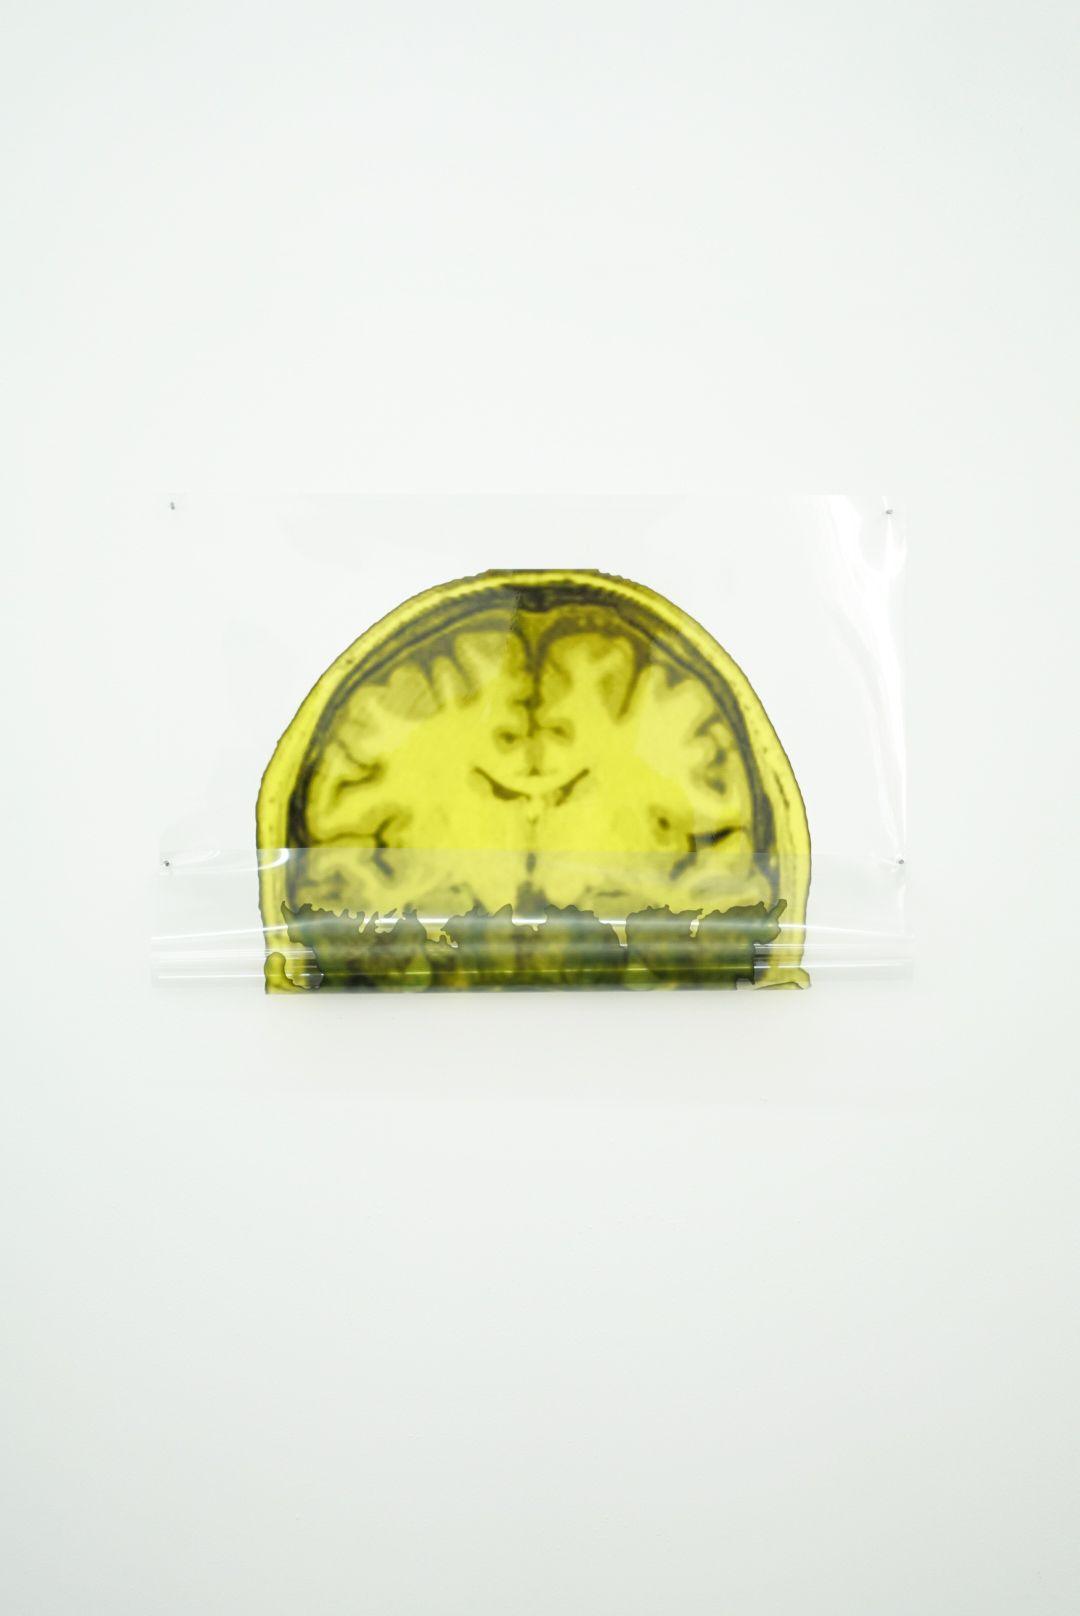 MICHAEL VICKERS | ARTIST PORTRAIT 5 (MRI/MEG)| ARCHIVAL PIGMENT PRINT ON CLEAR MYLAR | 13 X 17 INCHES| 2017